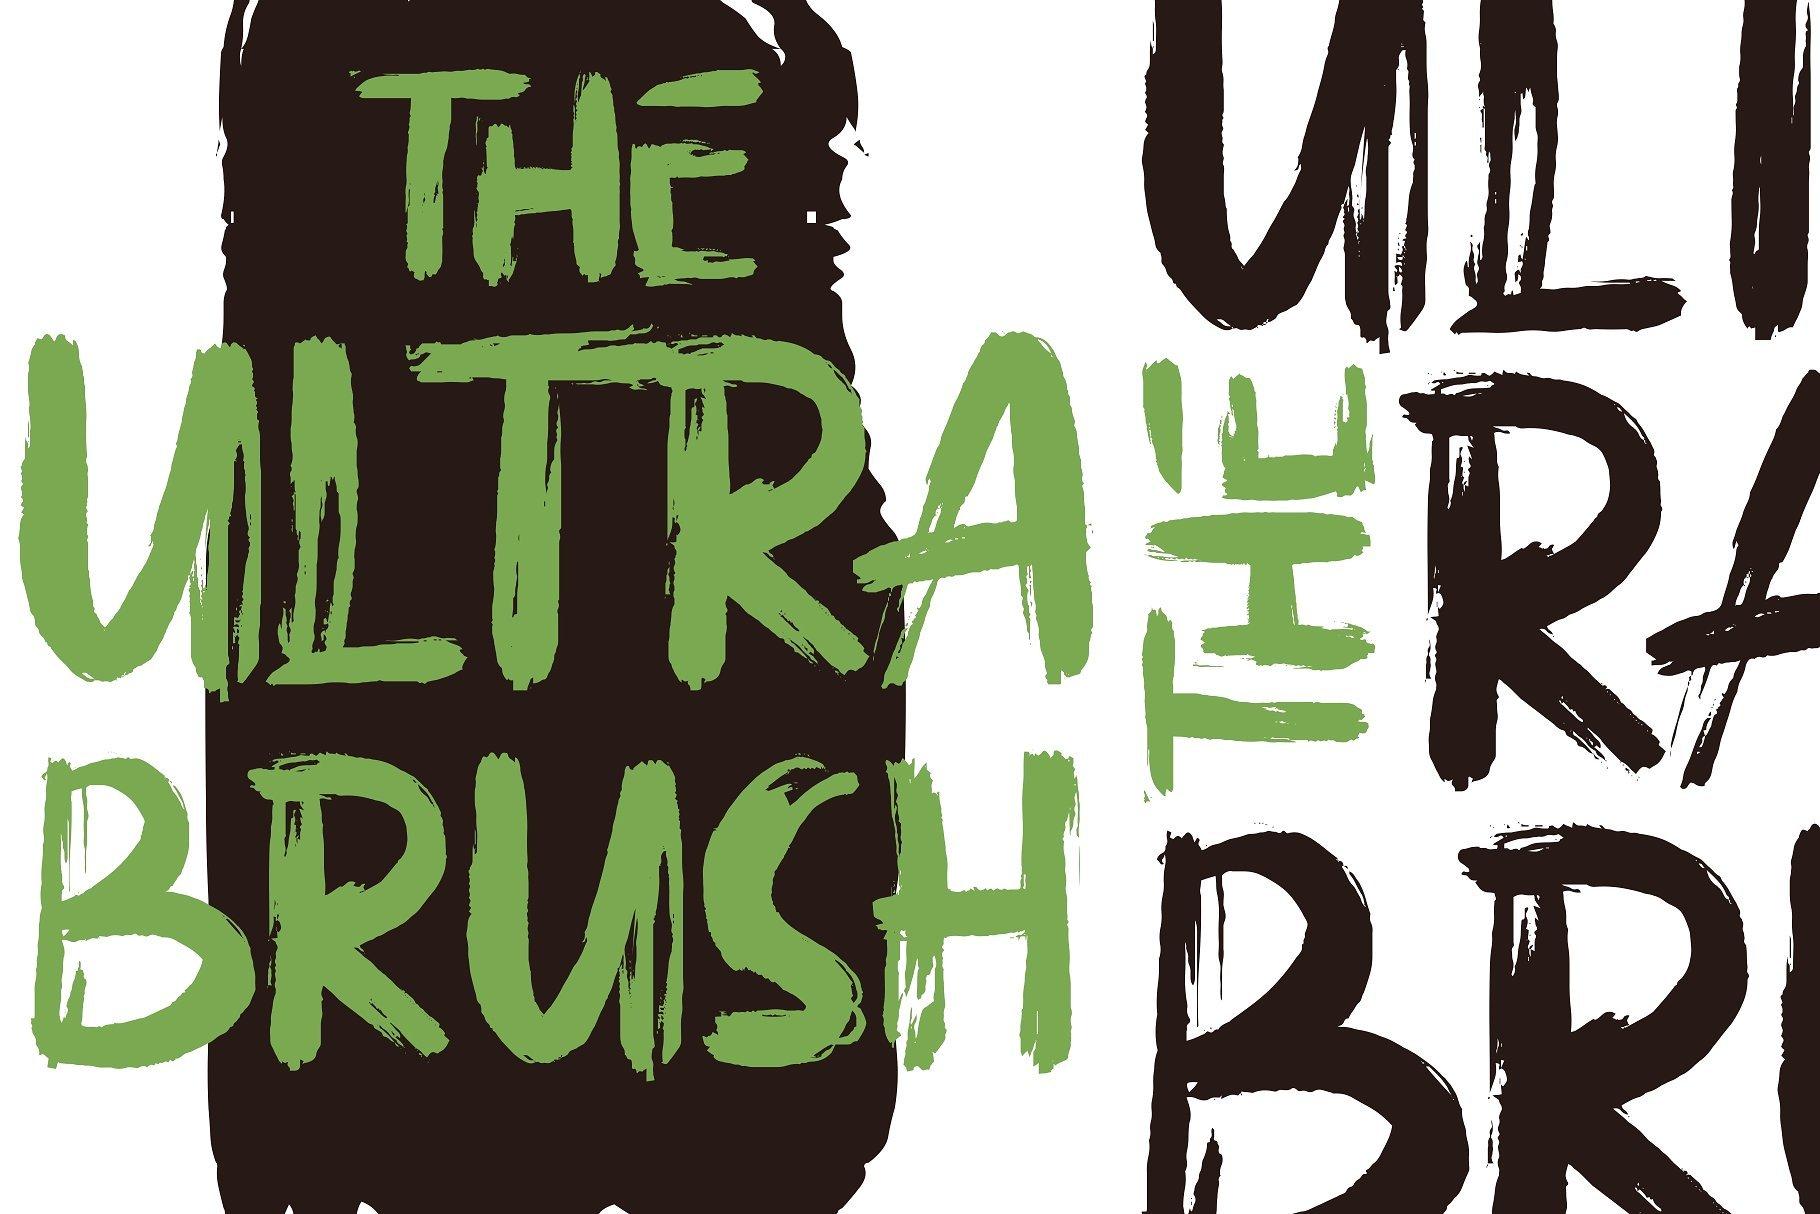 https://fontclarity.com/wp-content/uploads/2019/09/the-ultra-brush-font-download-0.jpg Free Download